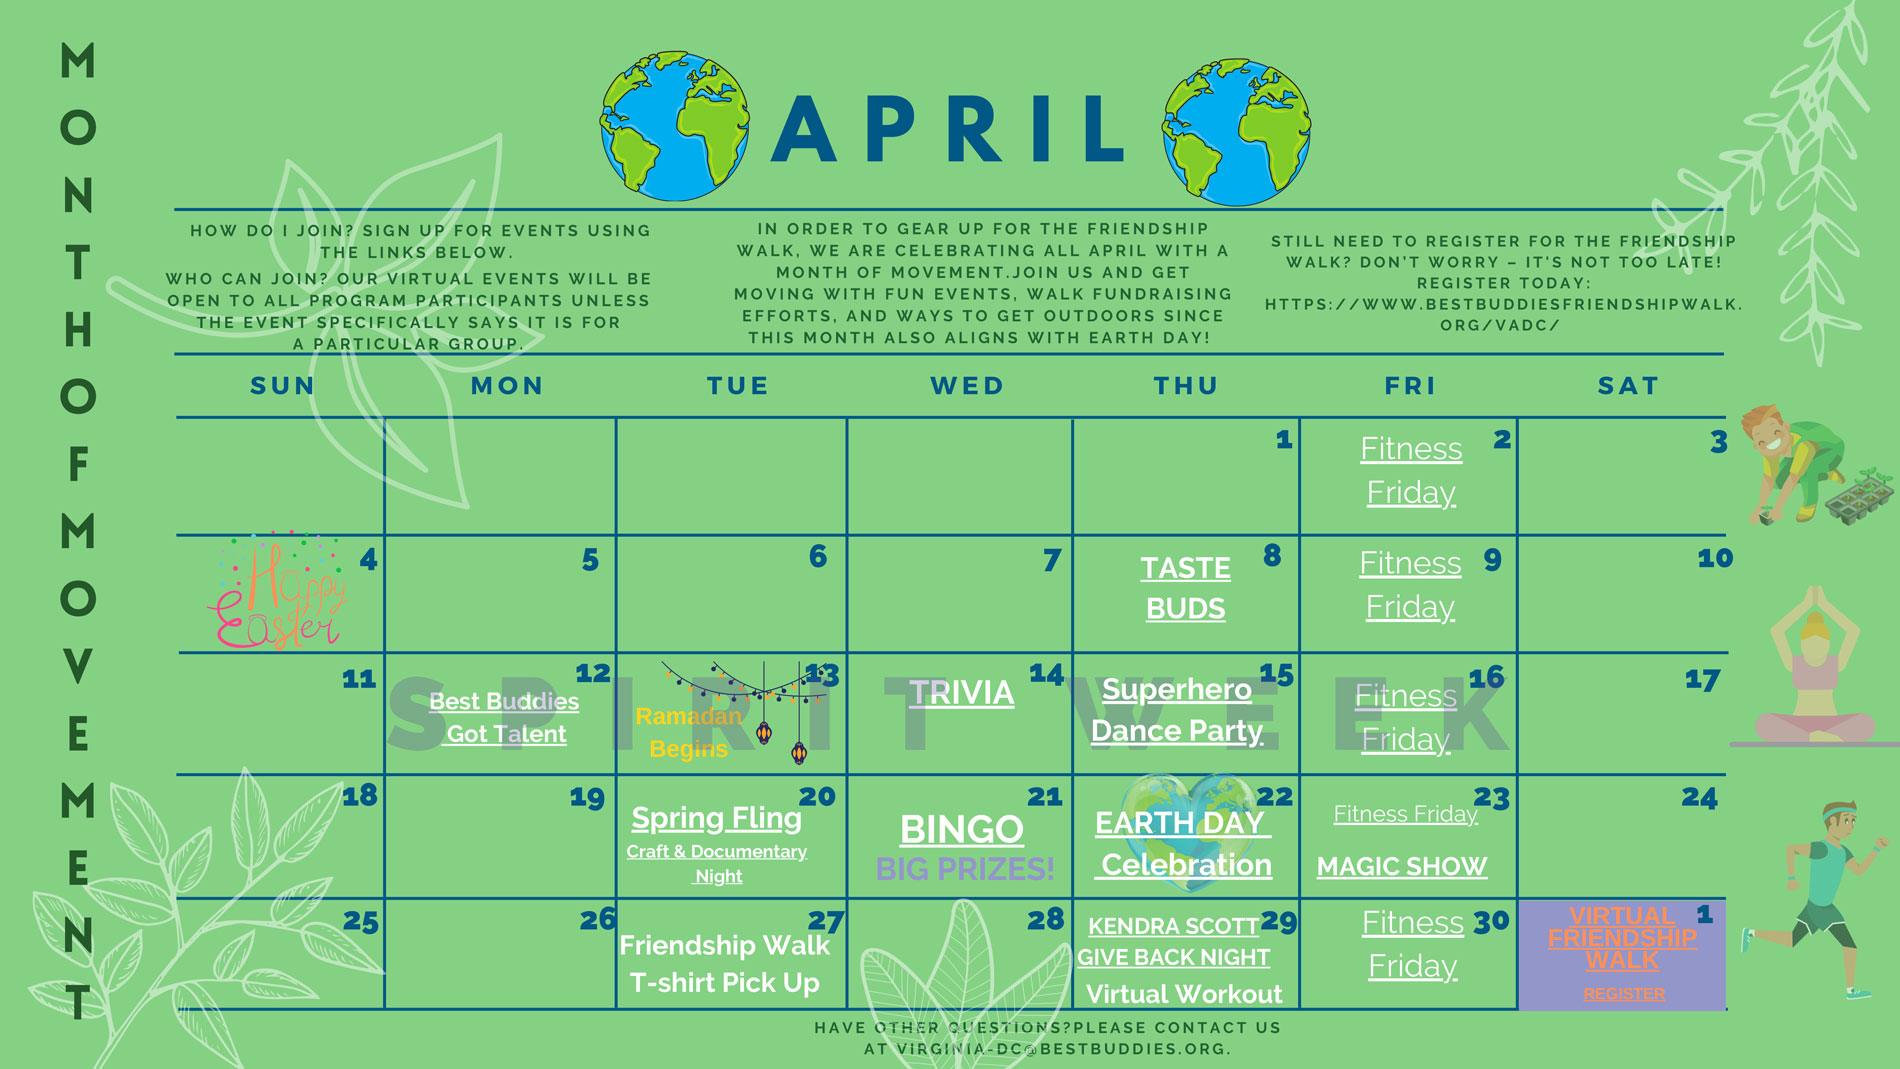 Best Buddies in VA & DC April Event Calendar